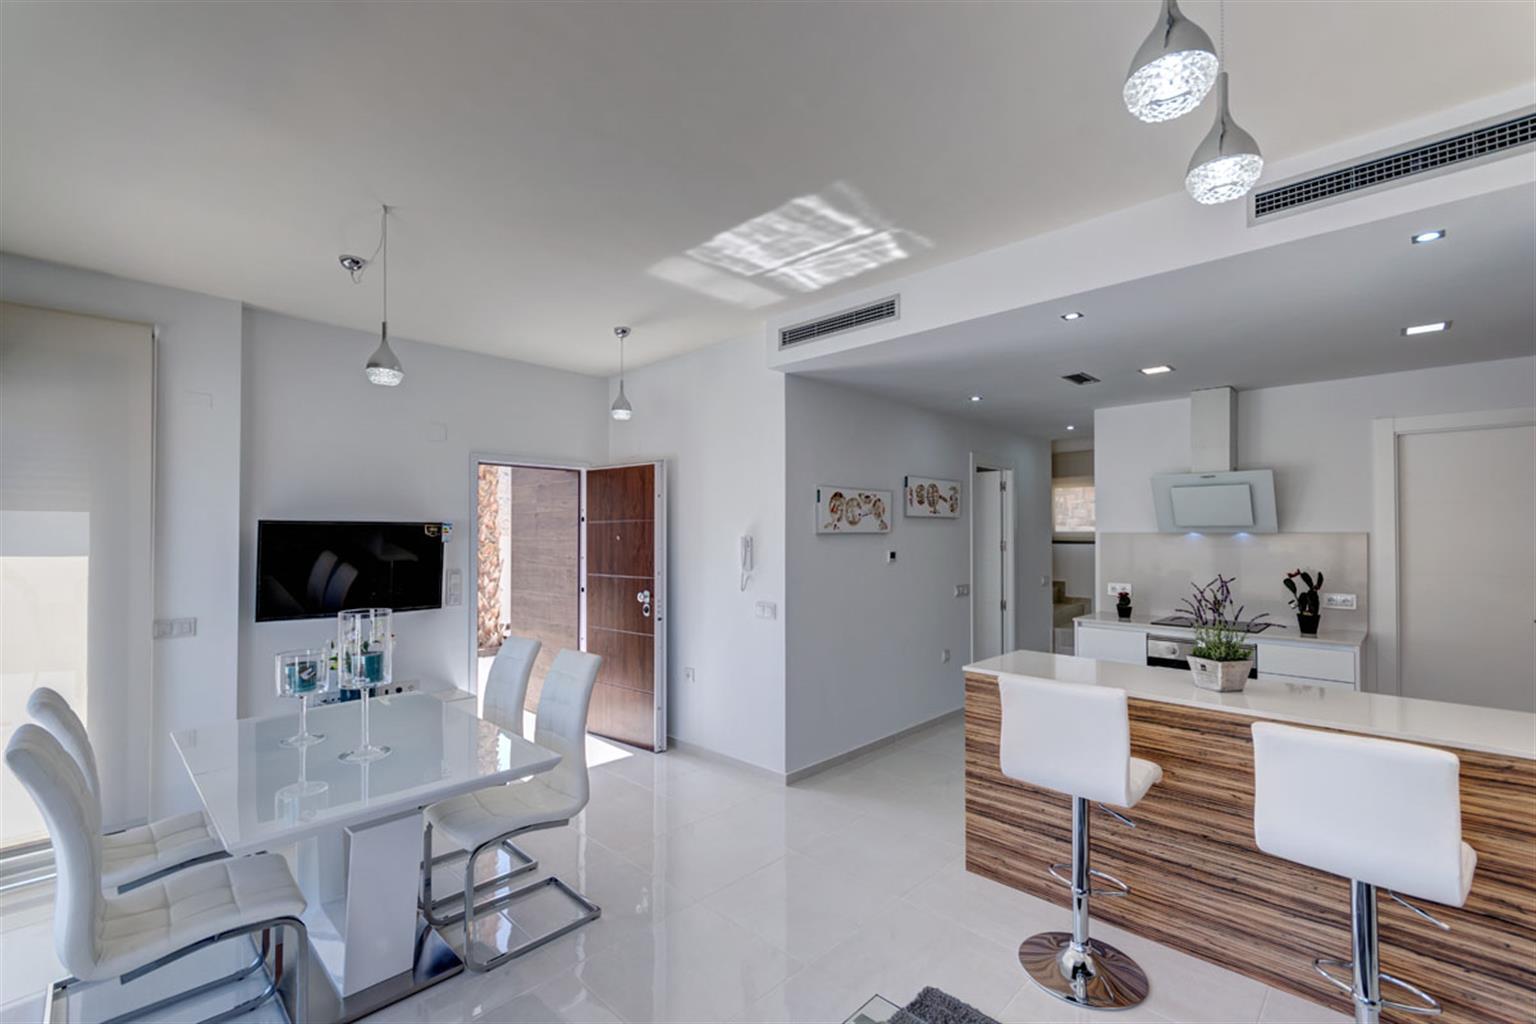 Maison - San Miguel De Salinas - #4227968-4